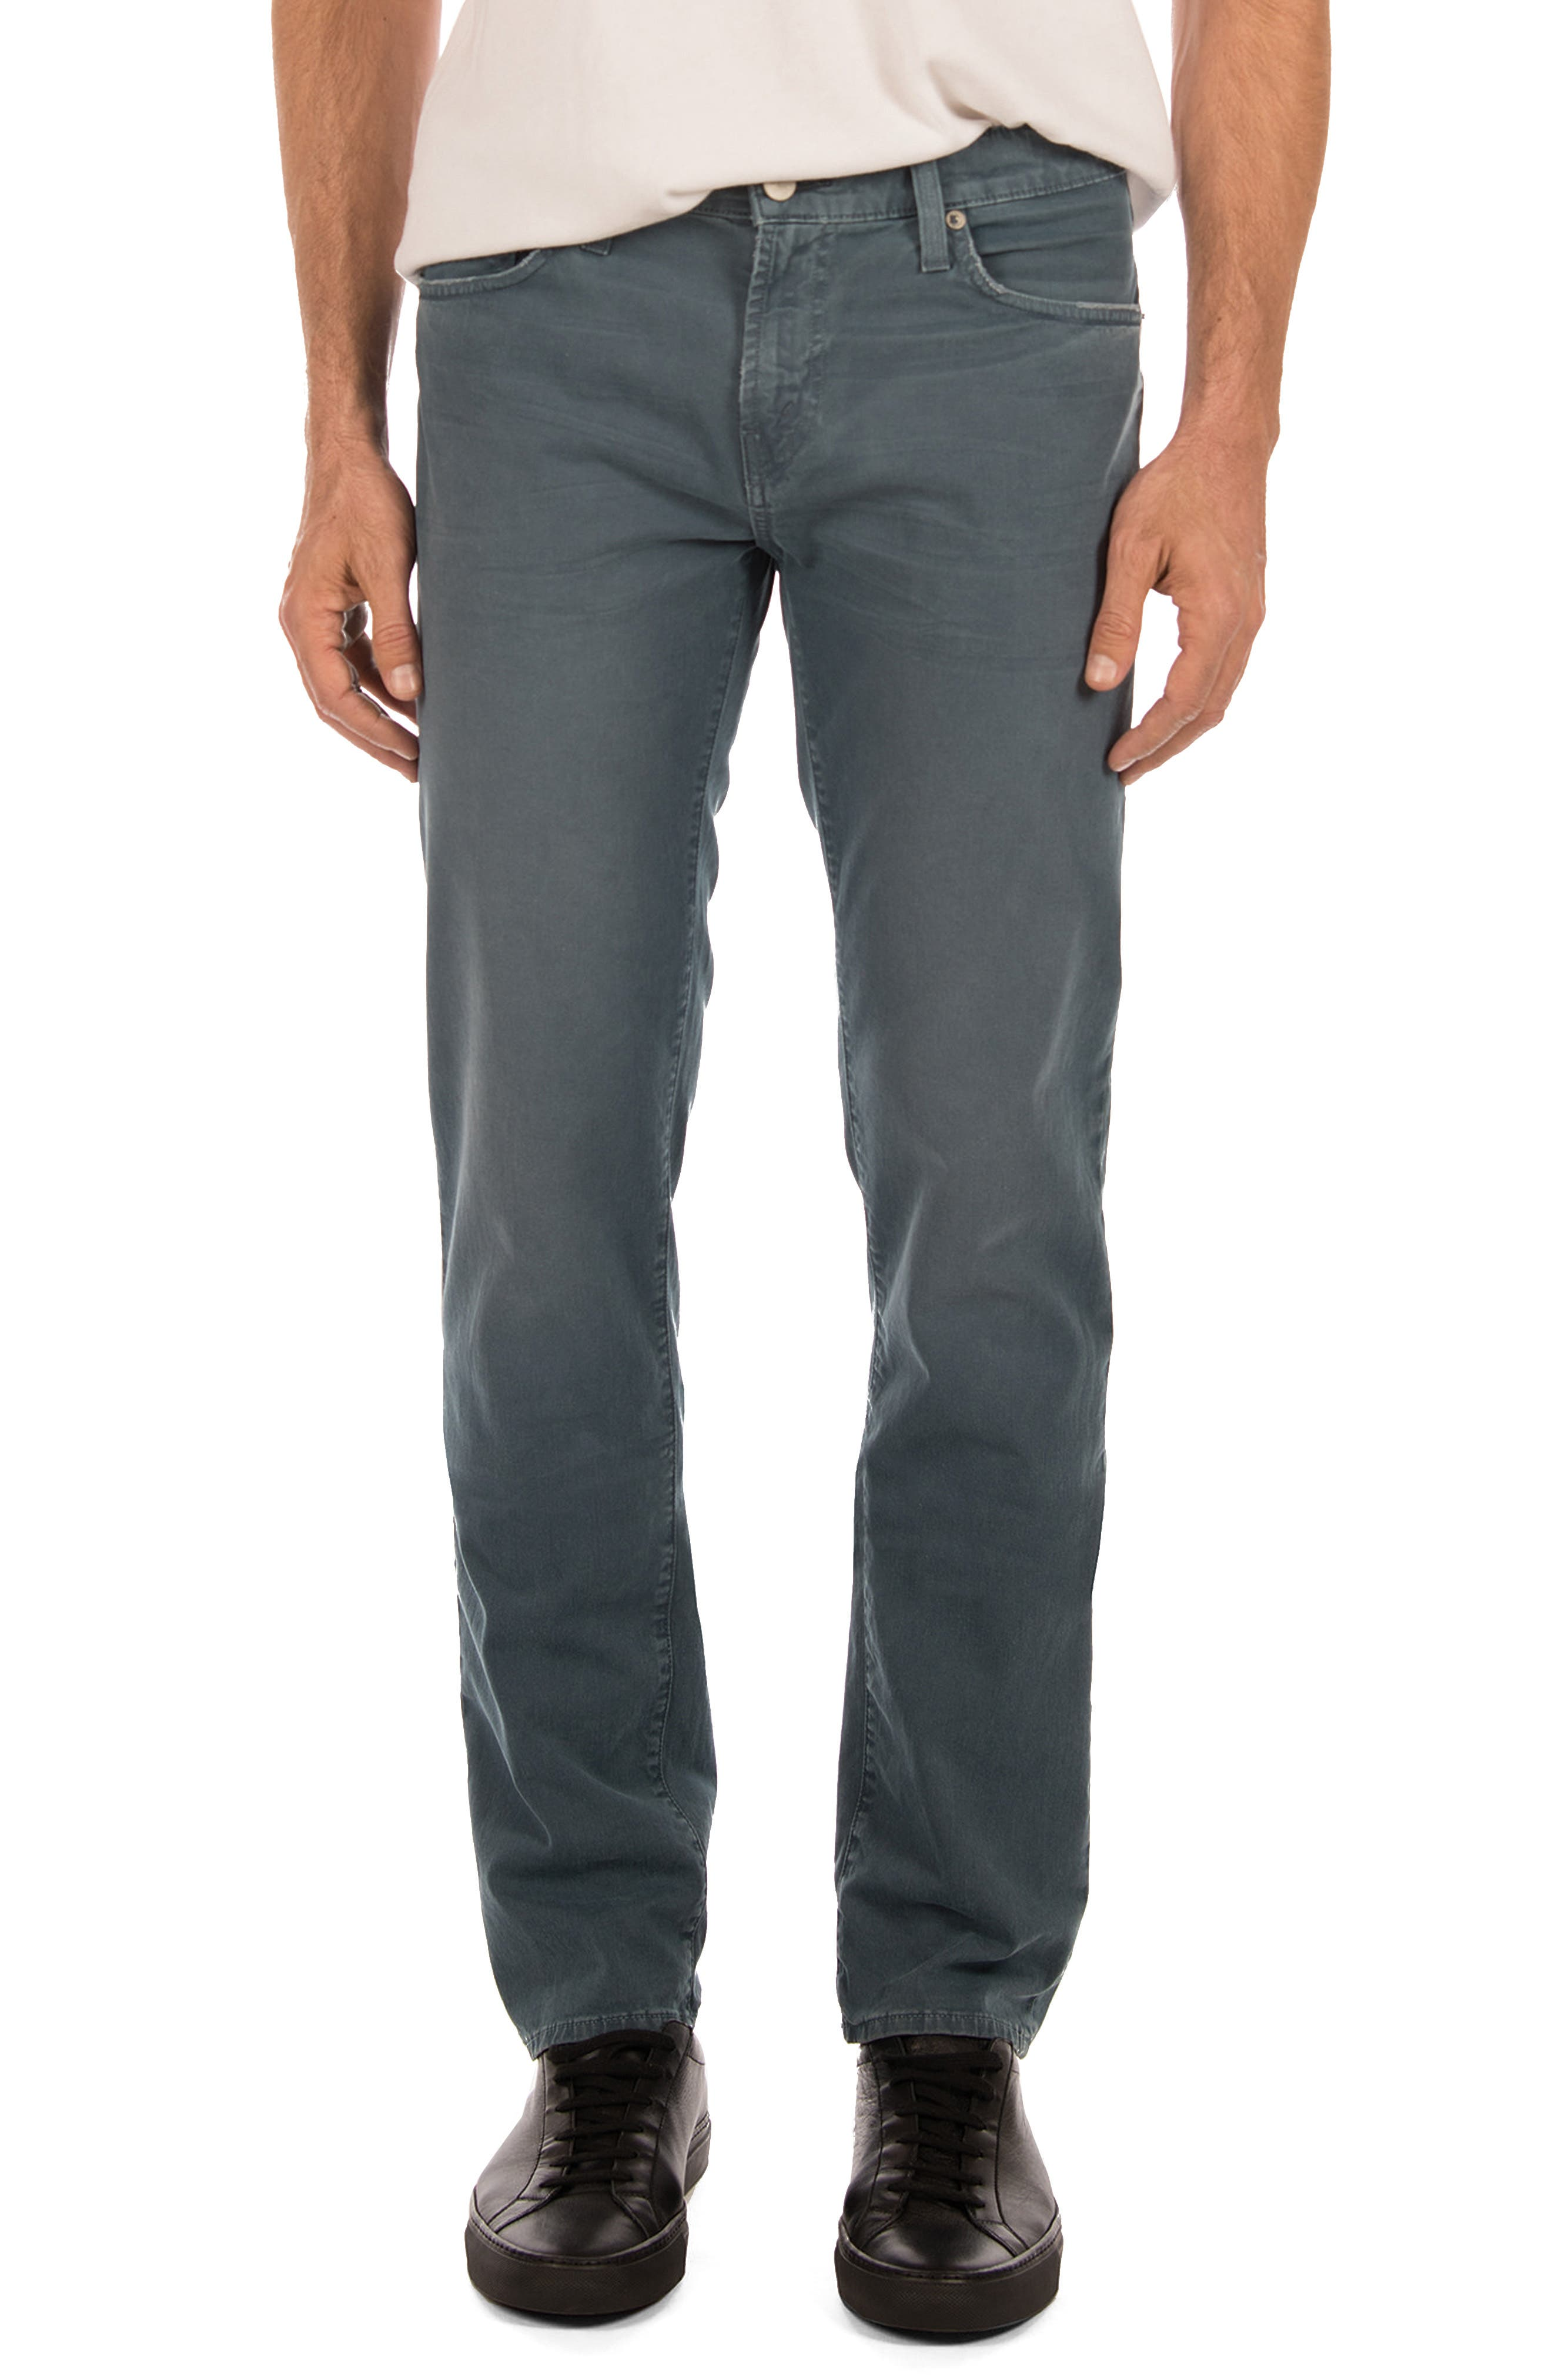 Tyler Slim Fit Jeans,                             Main thumbnail 1, color,                             Thrashed Tilite